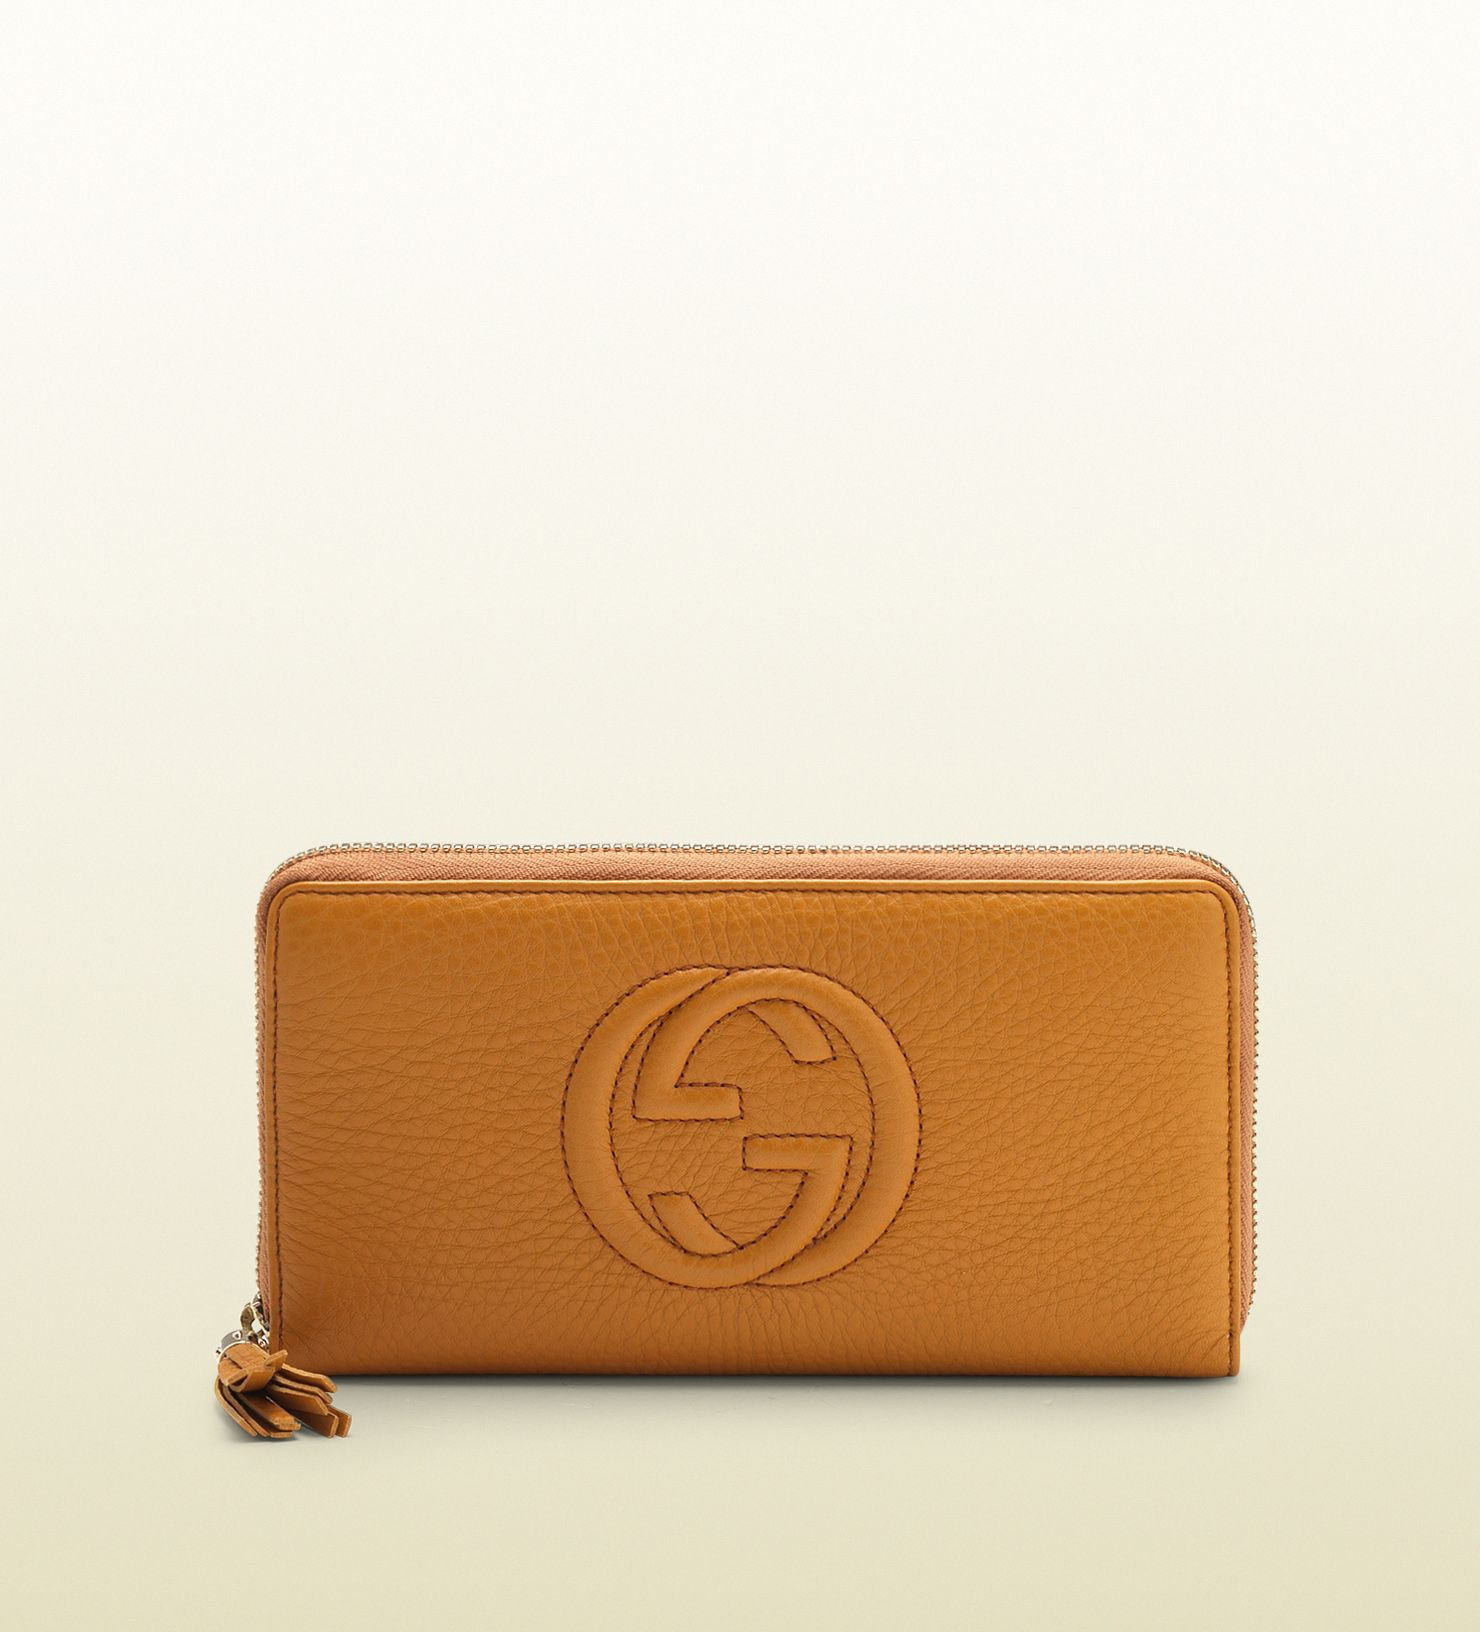 9f210ec2f28 Gucci - soho zip around wallet 308004A7M0G1610